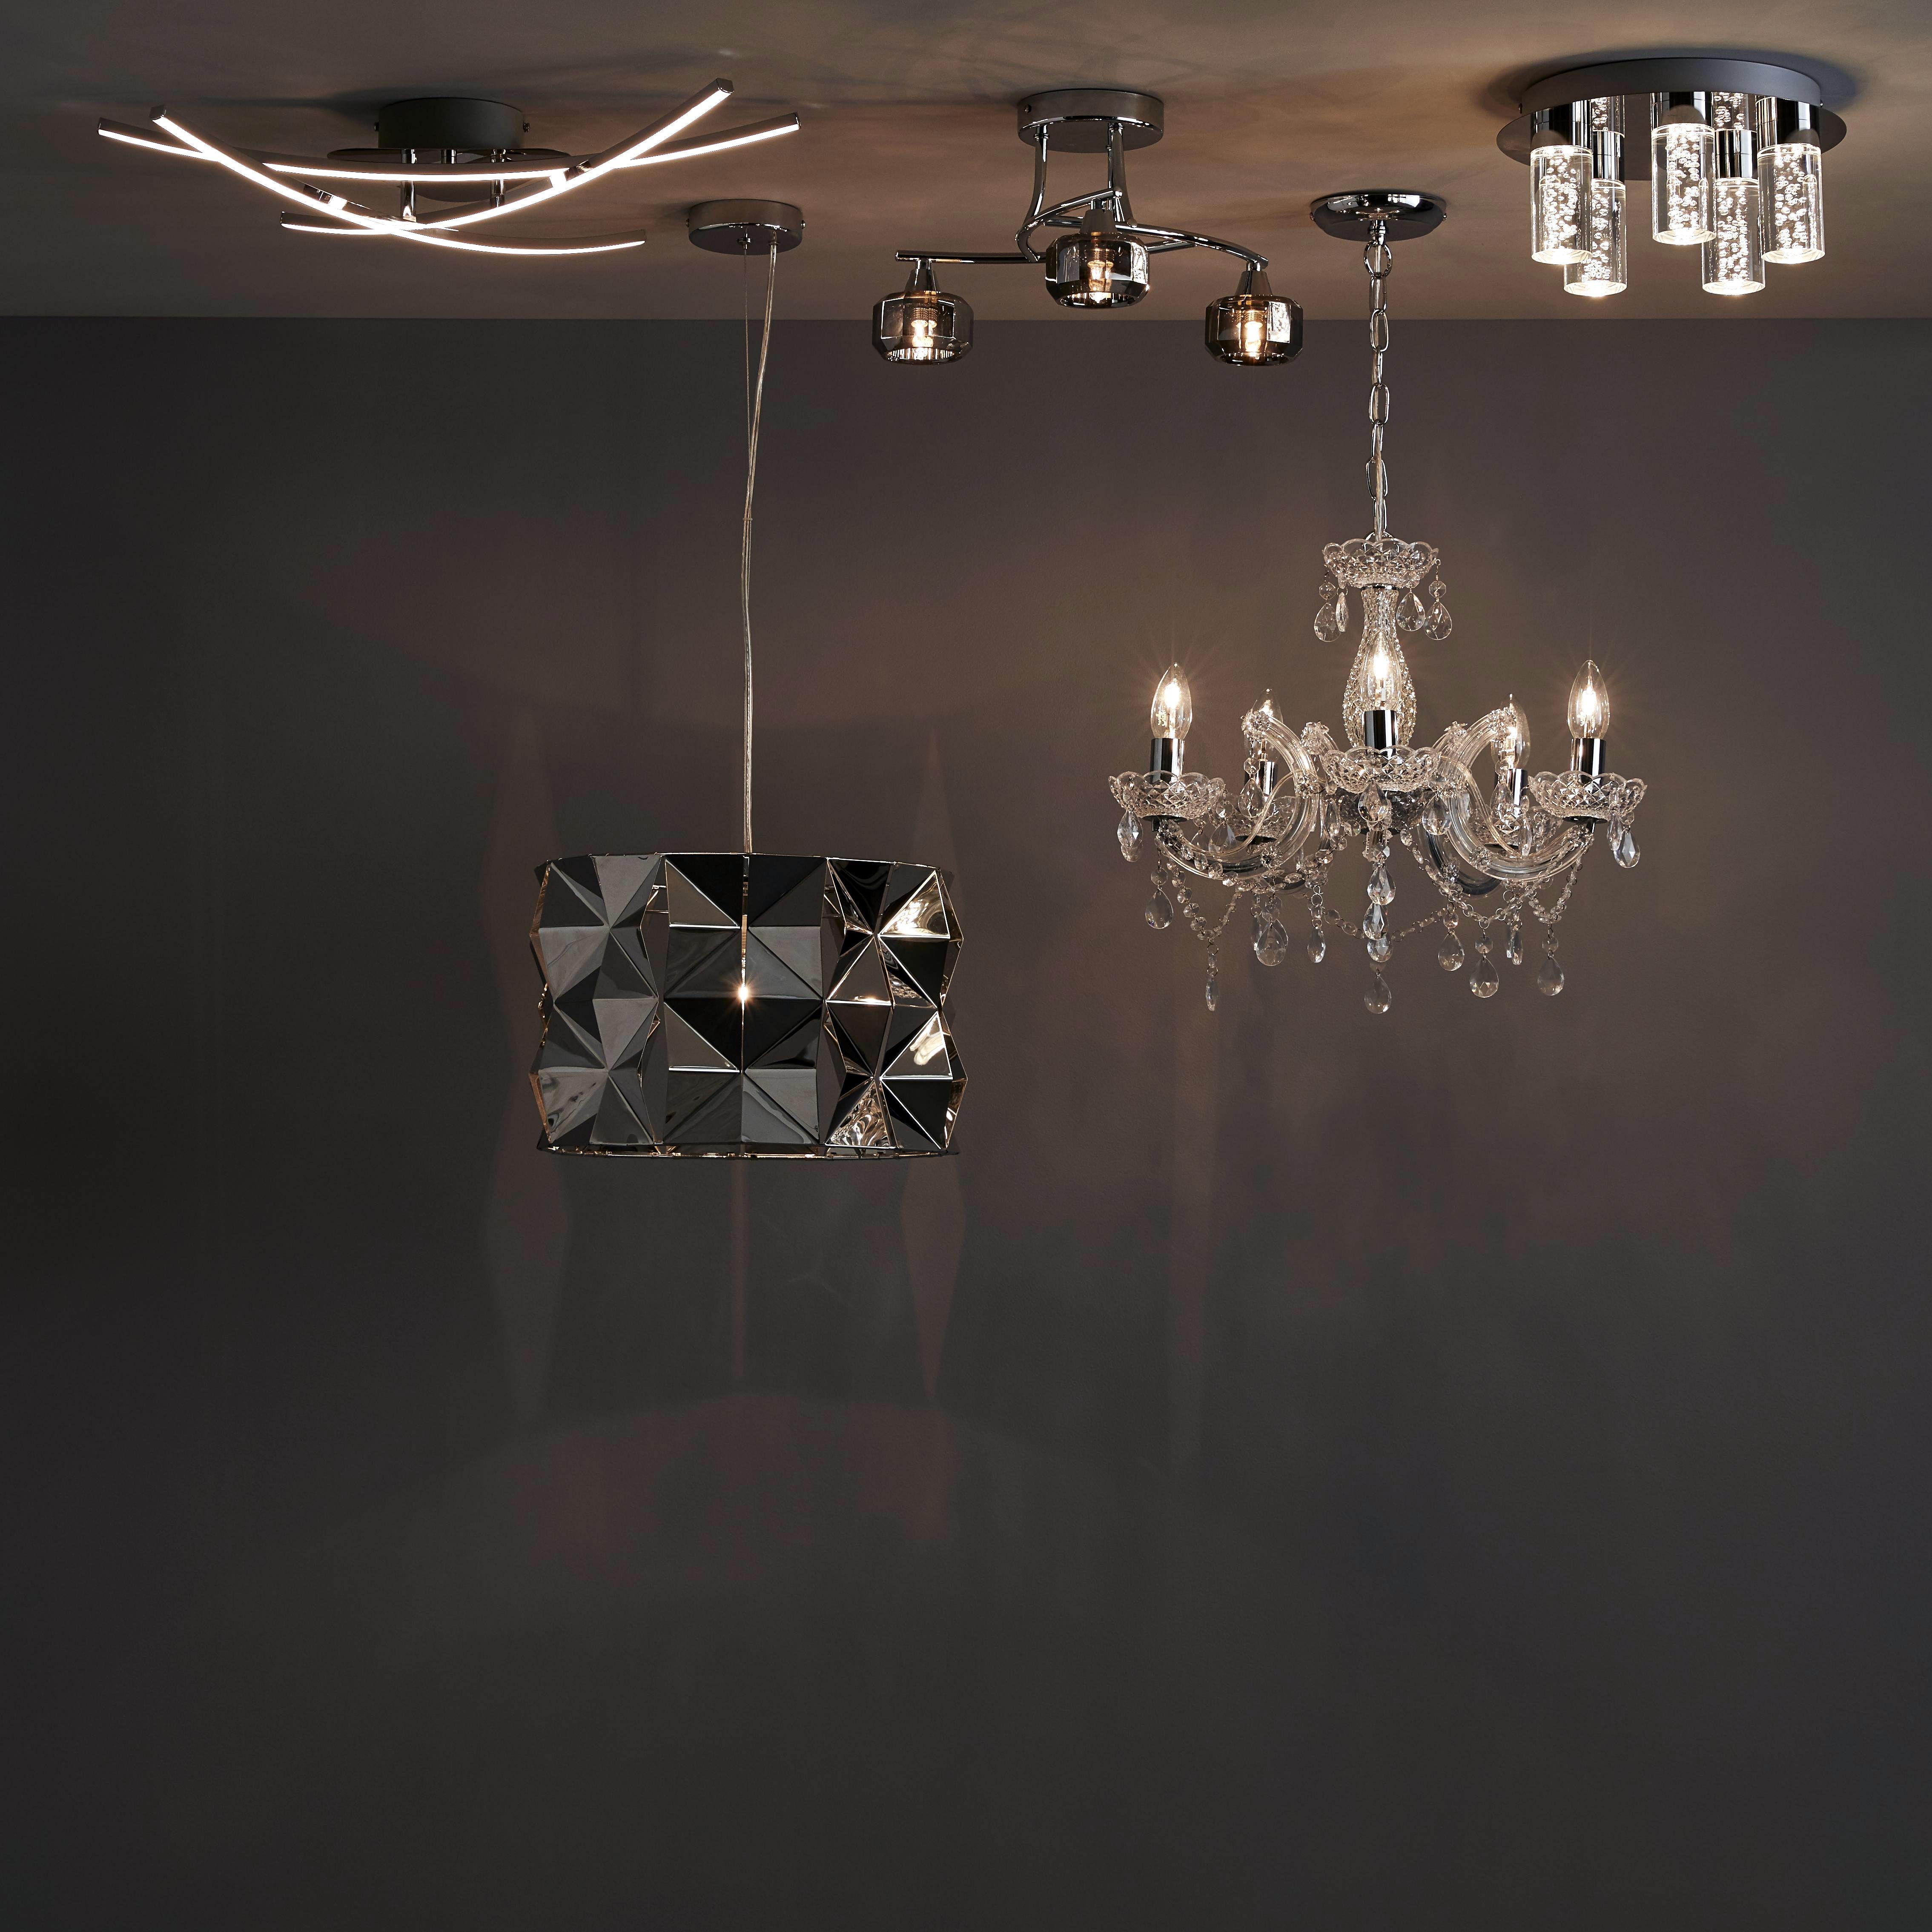 Ceiling lights & Indoor Lighting | Lamp Shades u0026 Lights